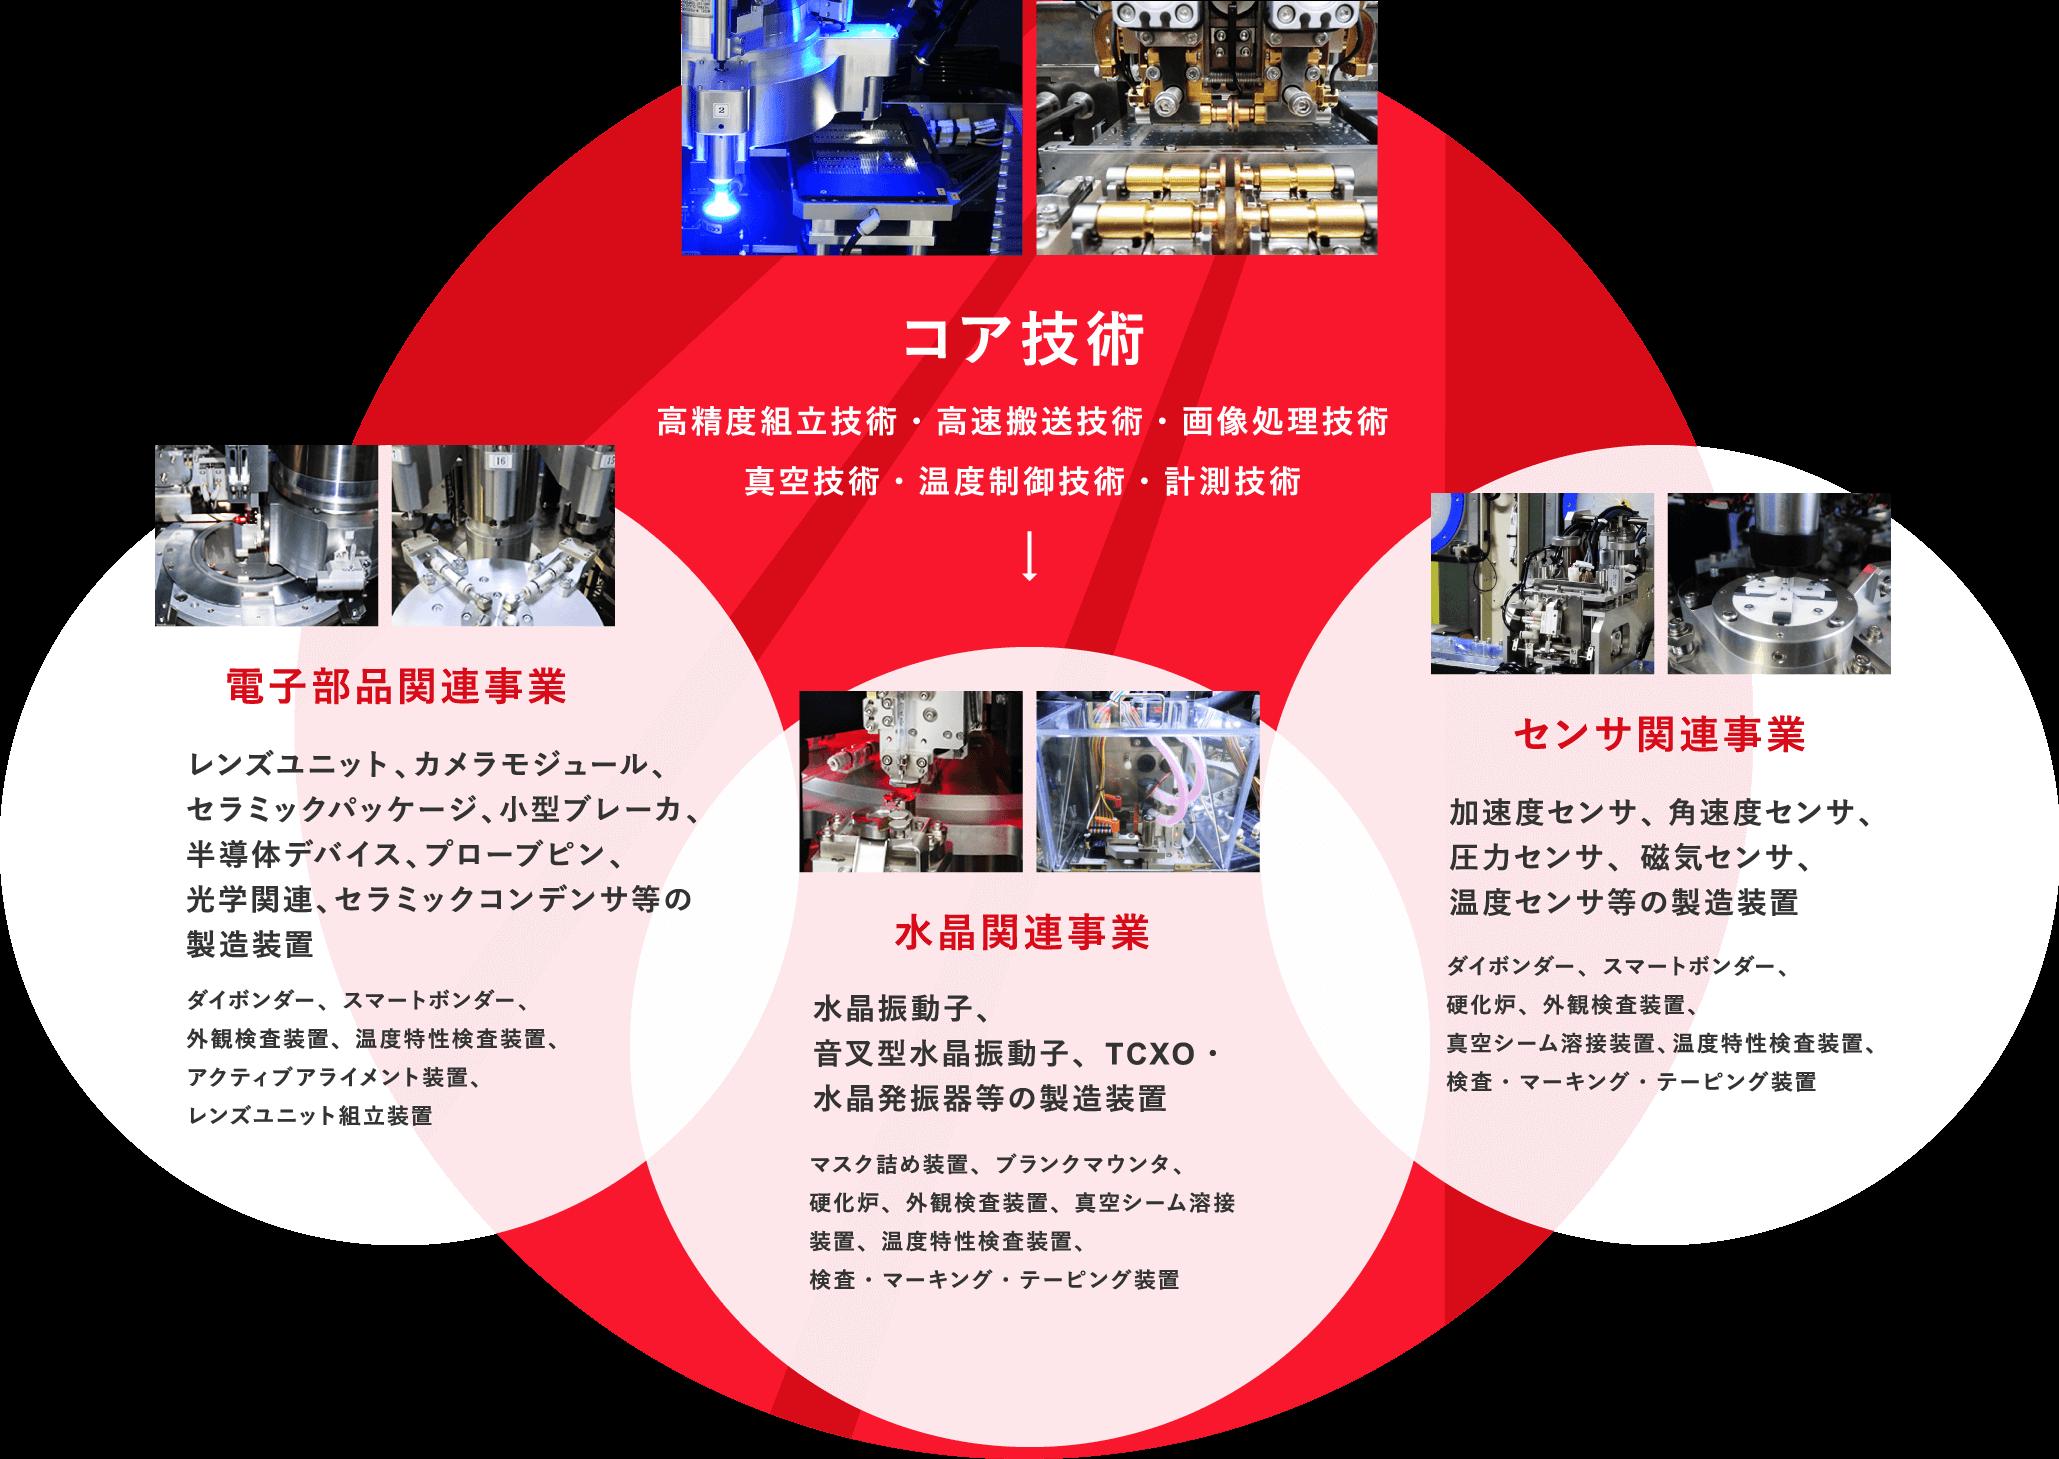 AKIM テクノロジー 電子部品関連・水晶関連・センサ関連の自動化設備